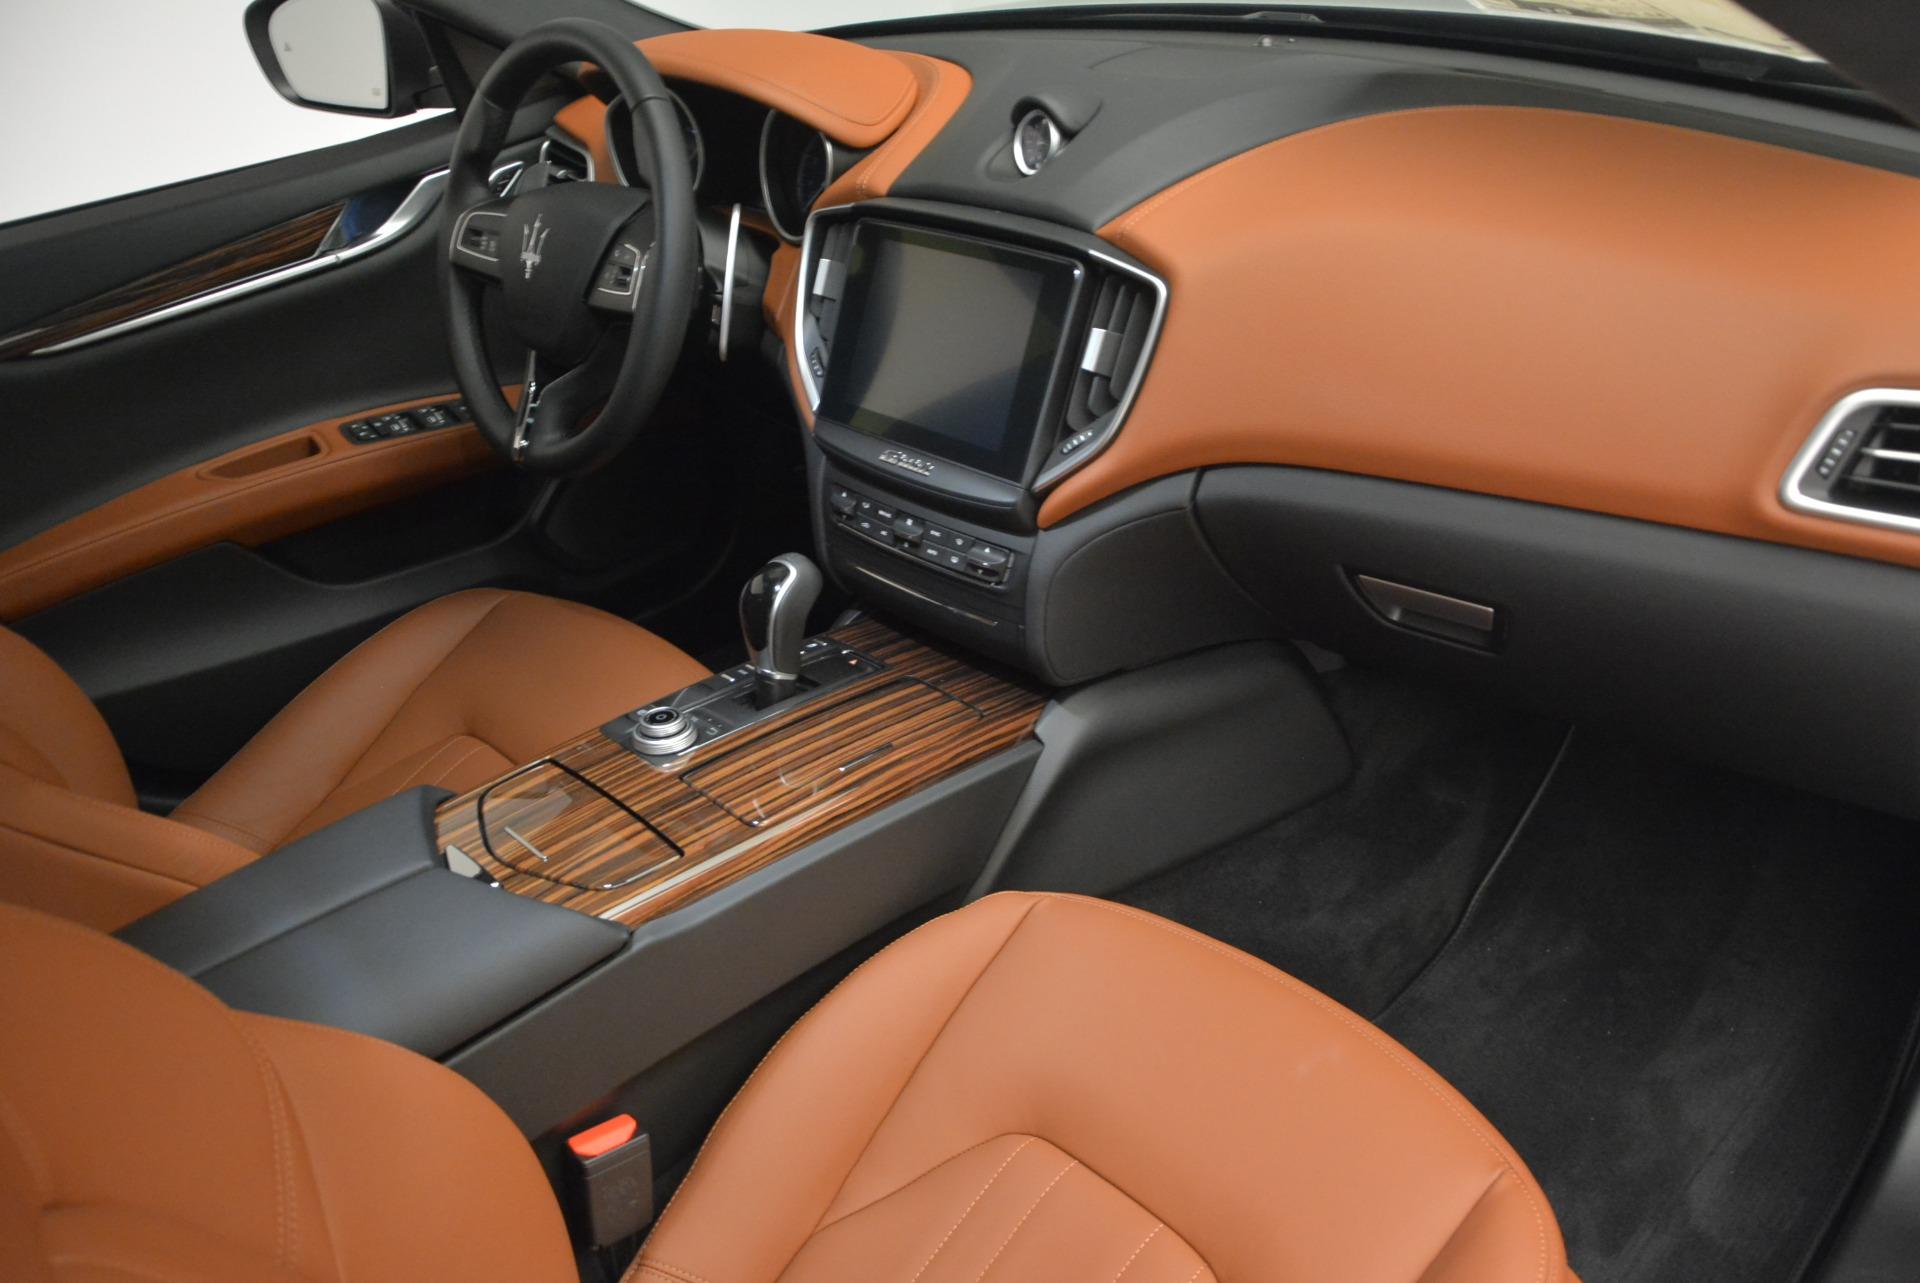 Used 2017 Maserati Ghibli S Q4 Ex-Loaner For Sale In Westport, CT 719_p20